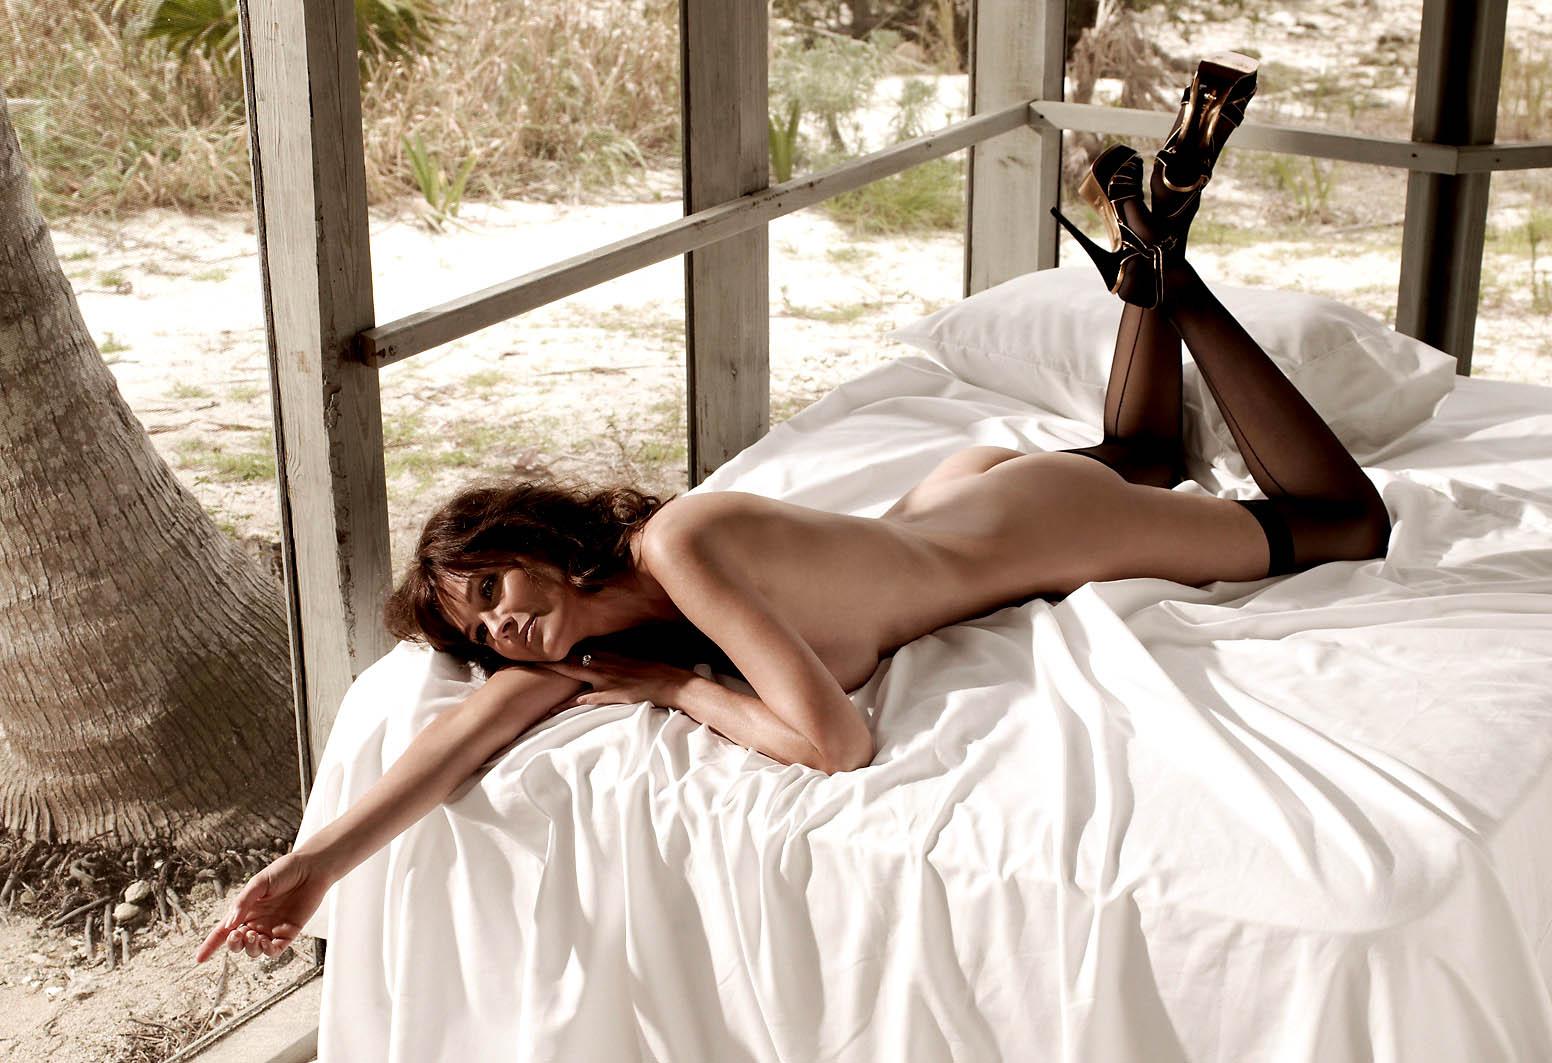 Hot korean mom nude pics